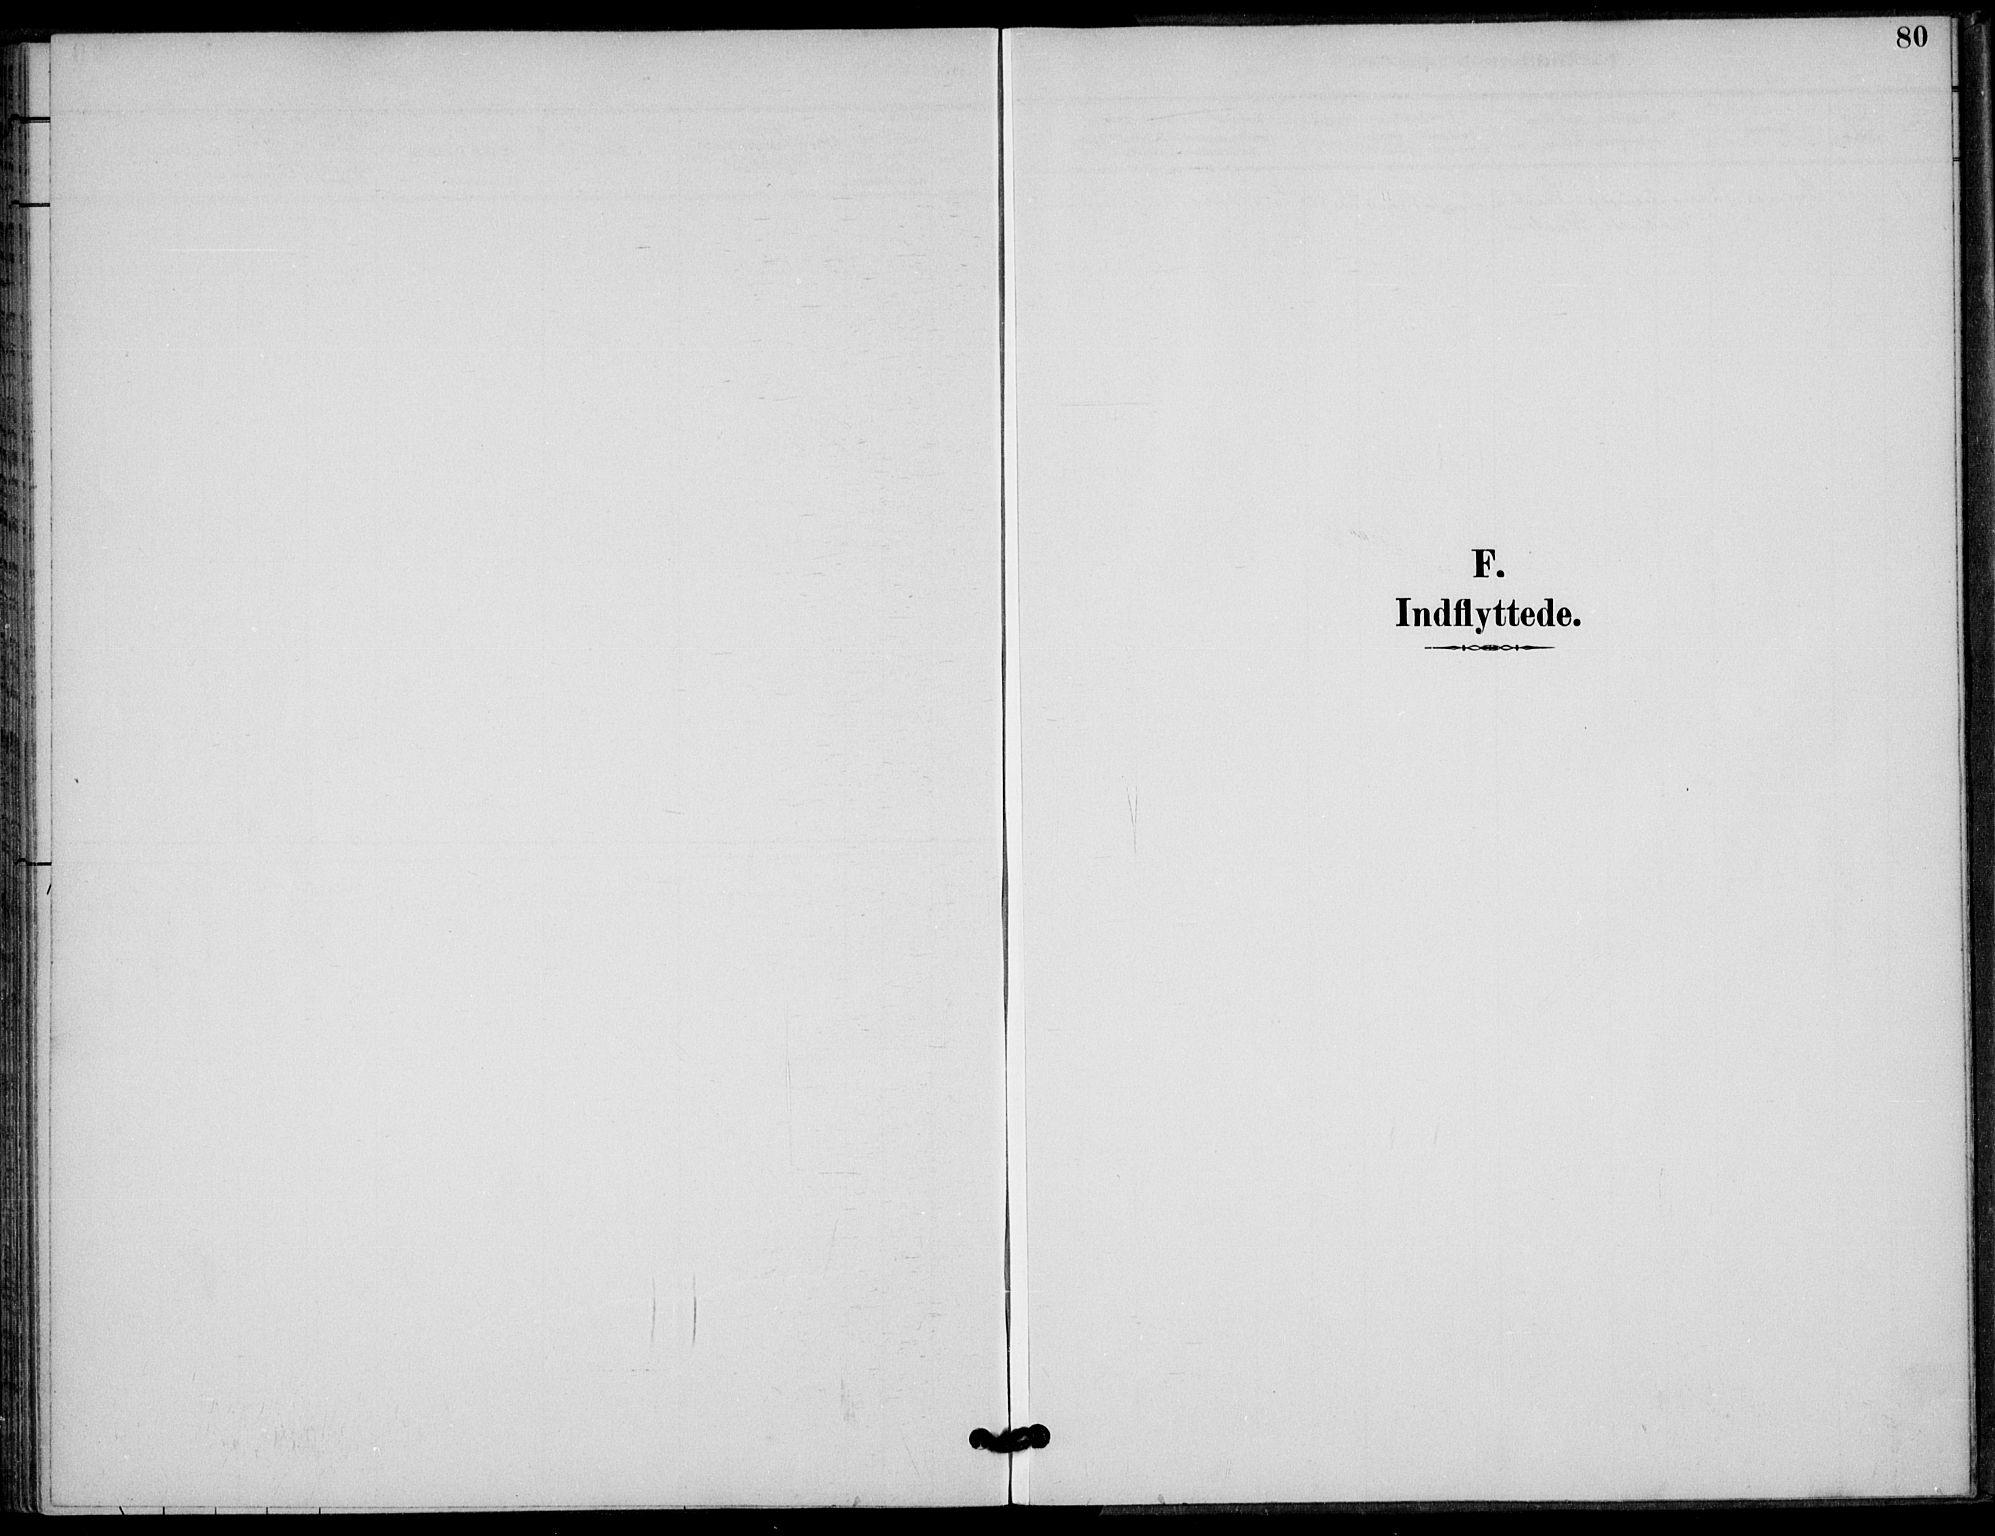 SAT, Ministerialprotokoller, klokkerbøker og fødselsregistre - Nordland, 825/L0363: Ministerialbok nr. 825A17, 1890-1909, s. 80